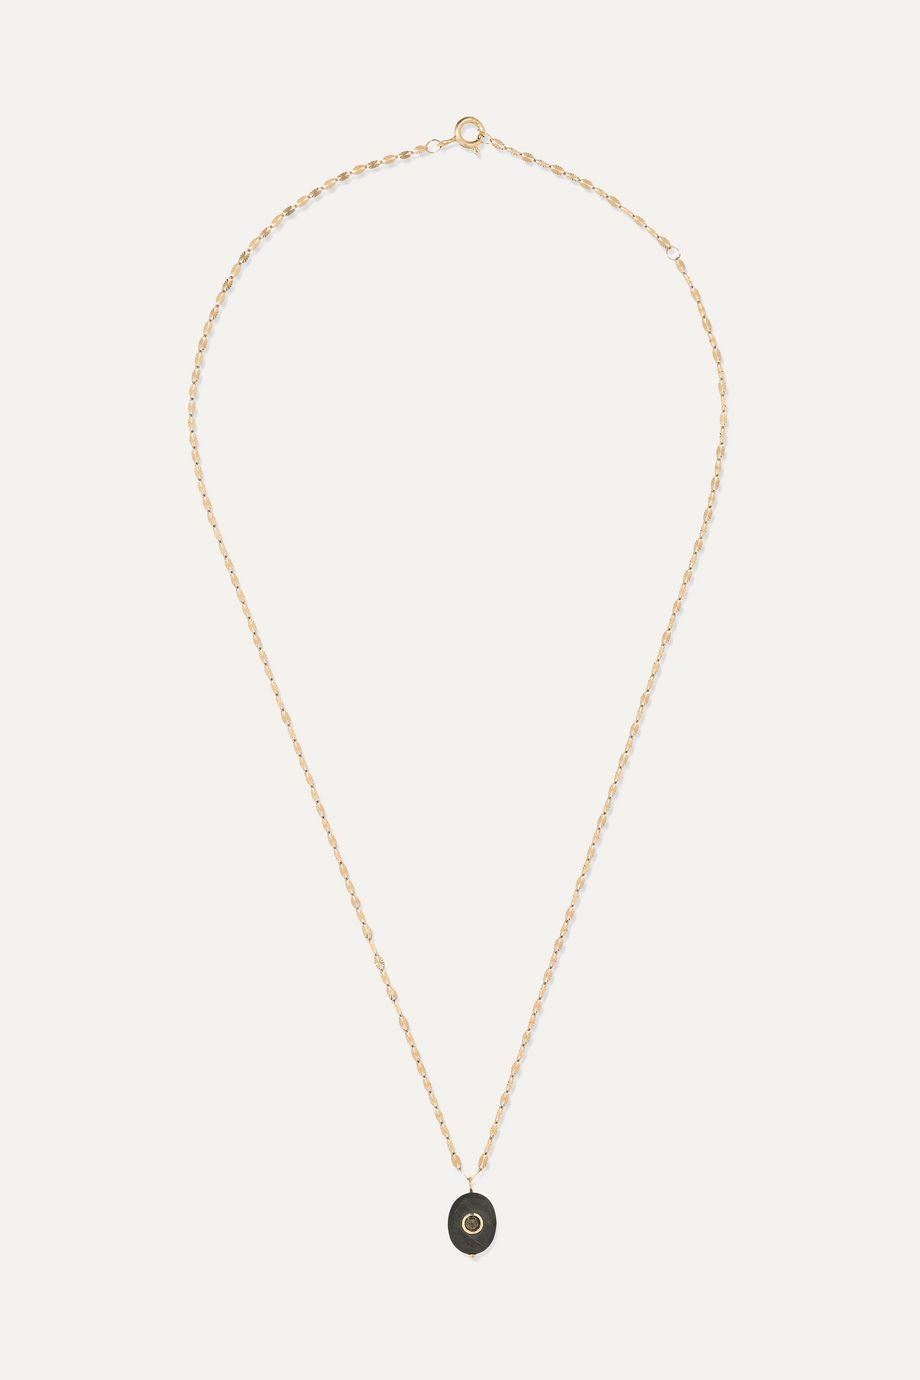 Pascale Monvoisin Holi 14-karat gold, tiger's eye and diamond necklace